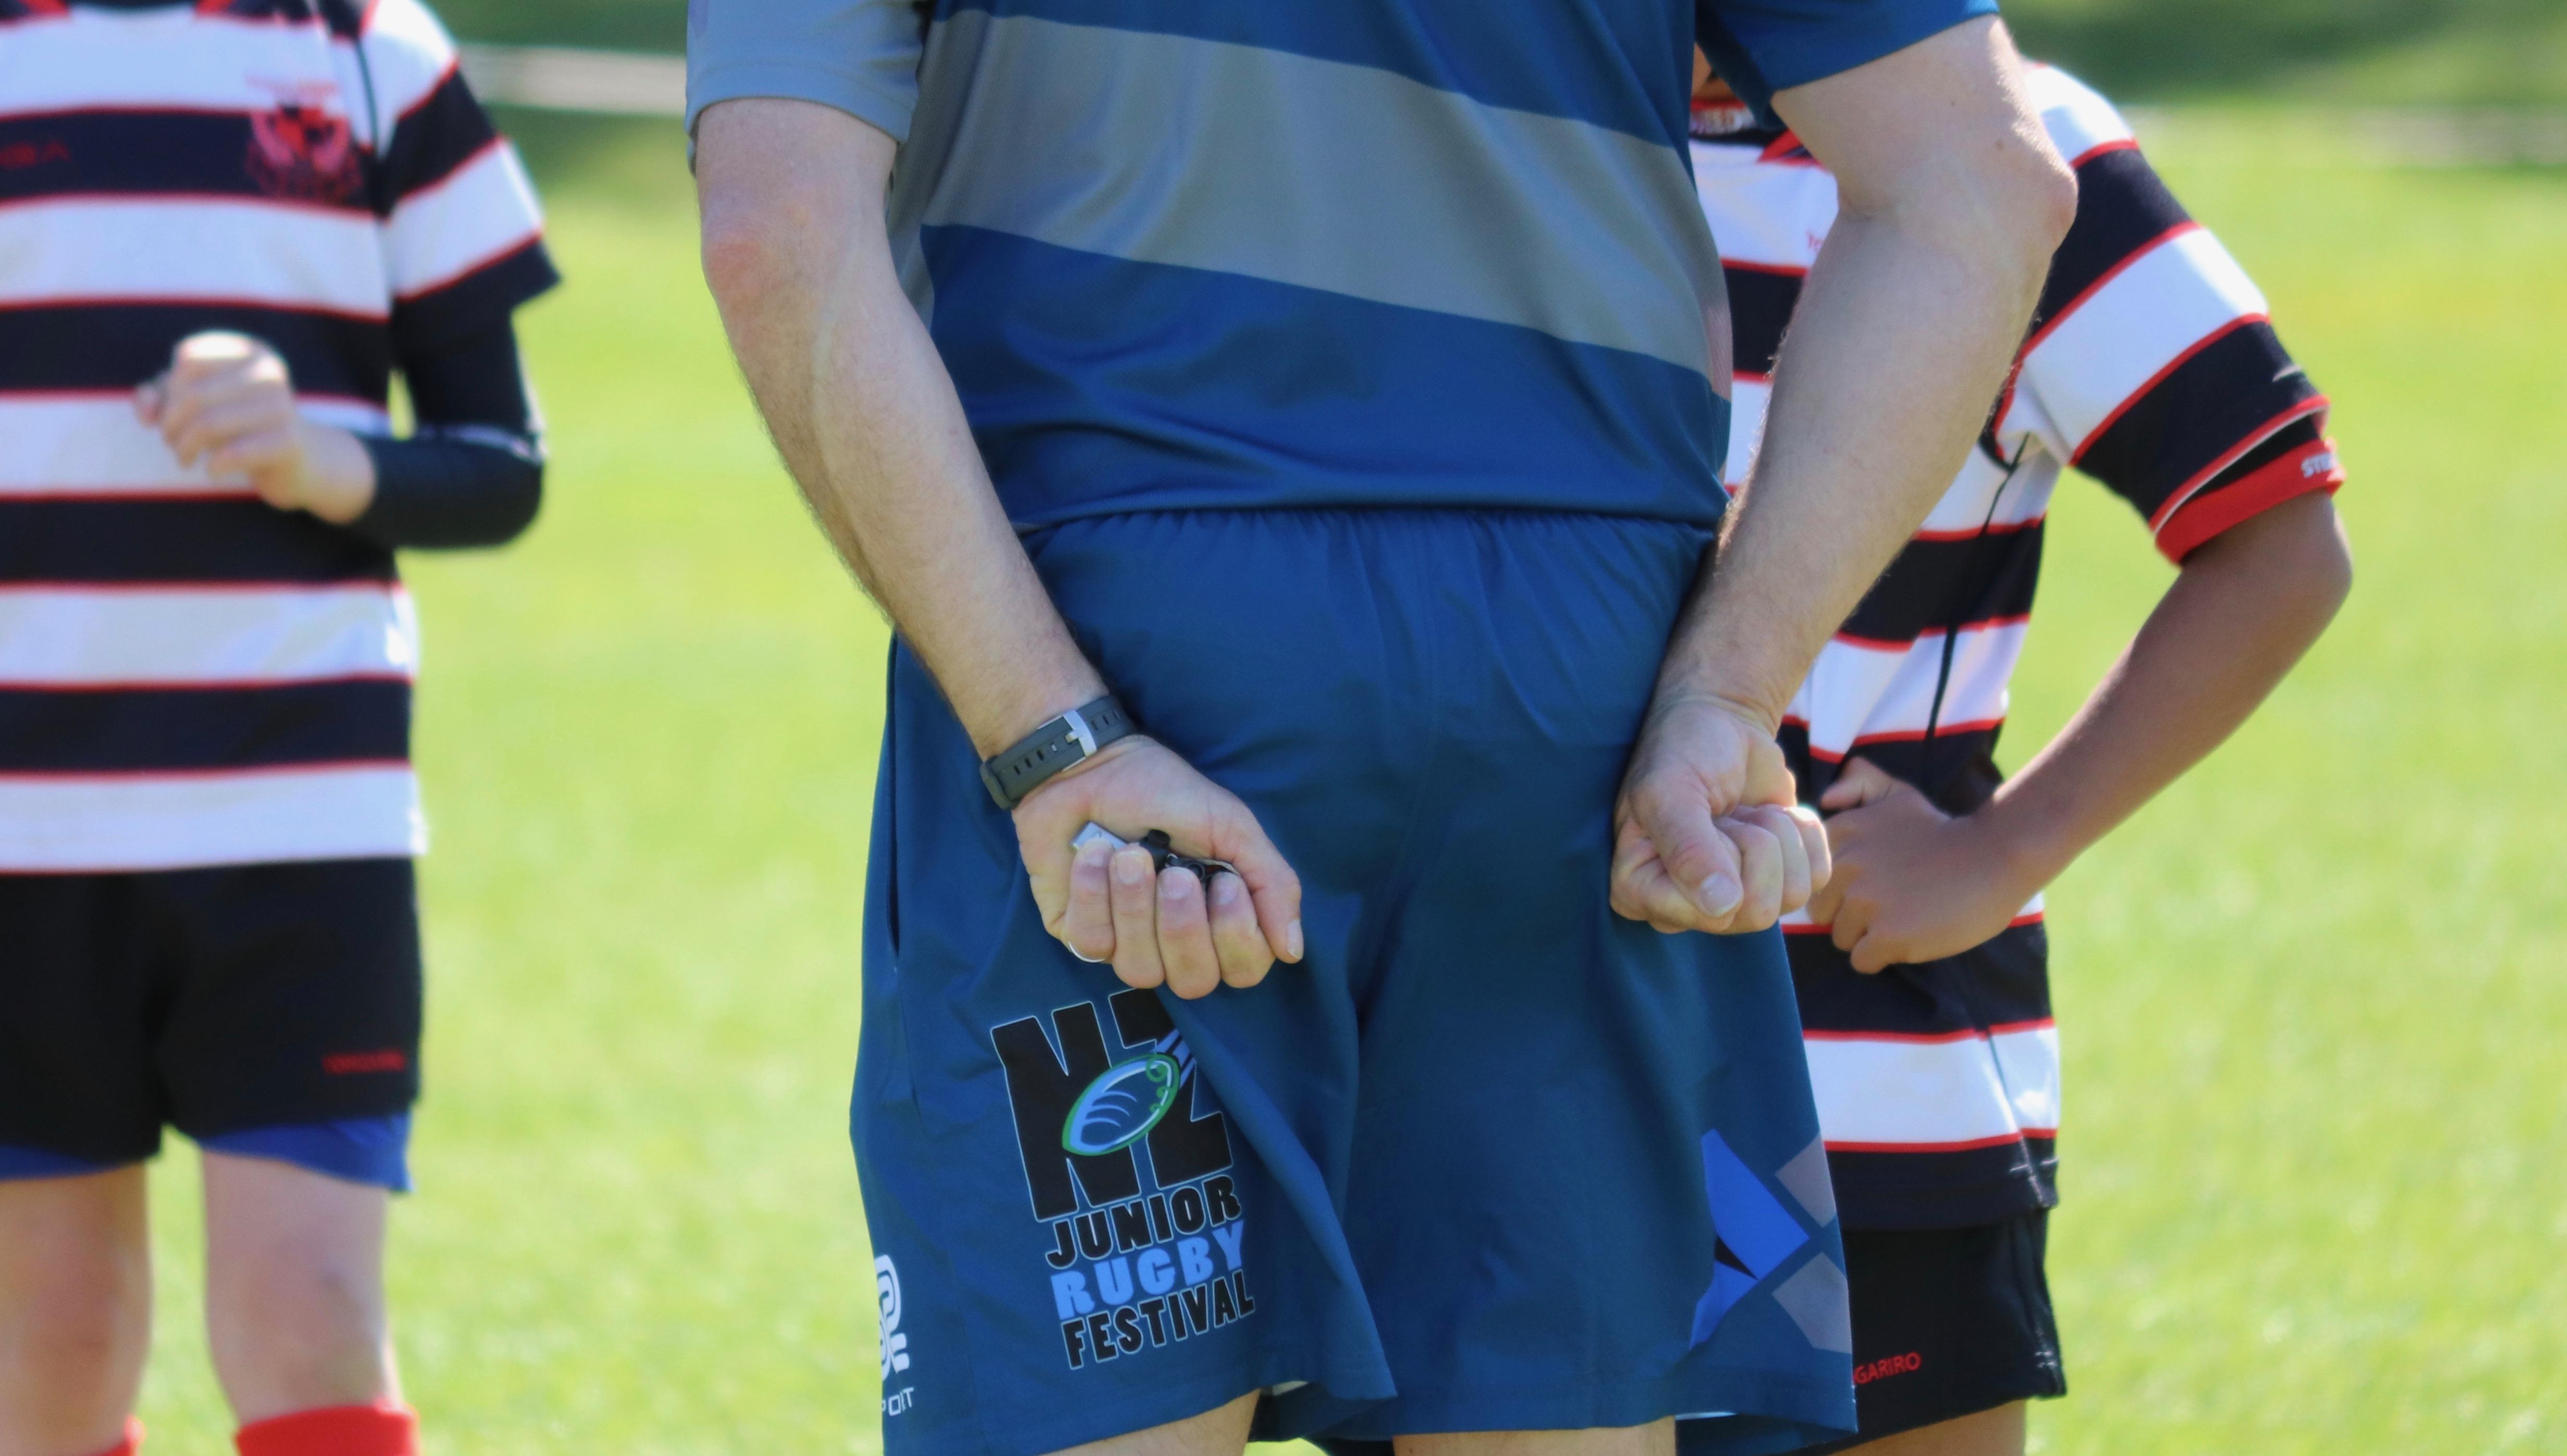 Referee hands